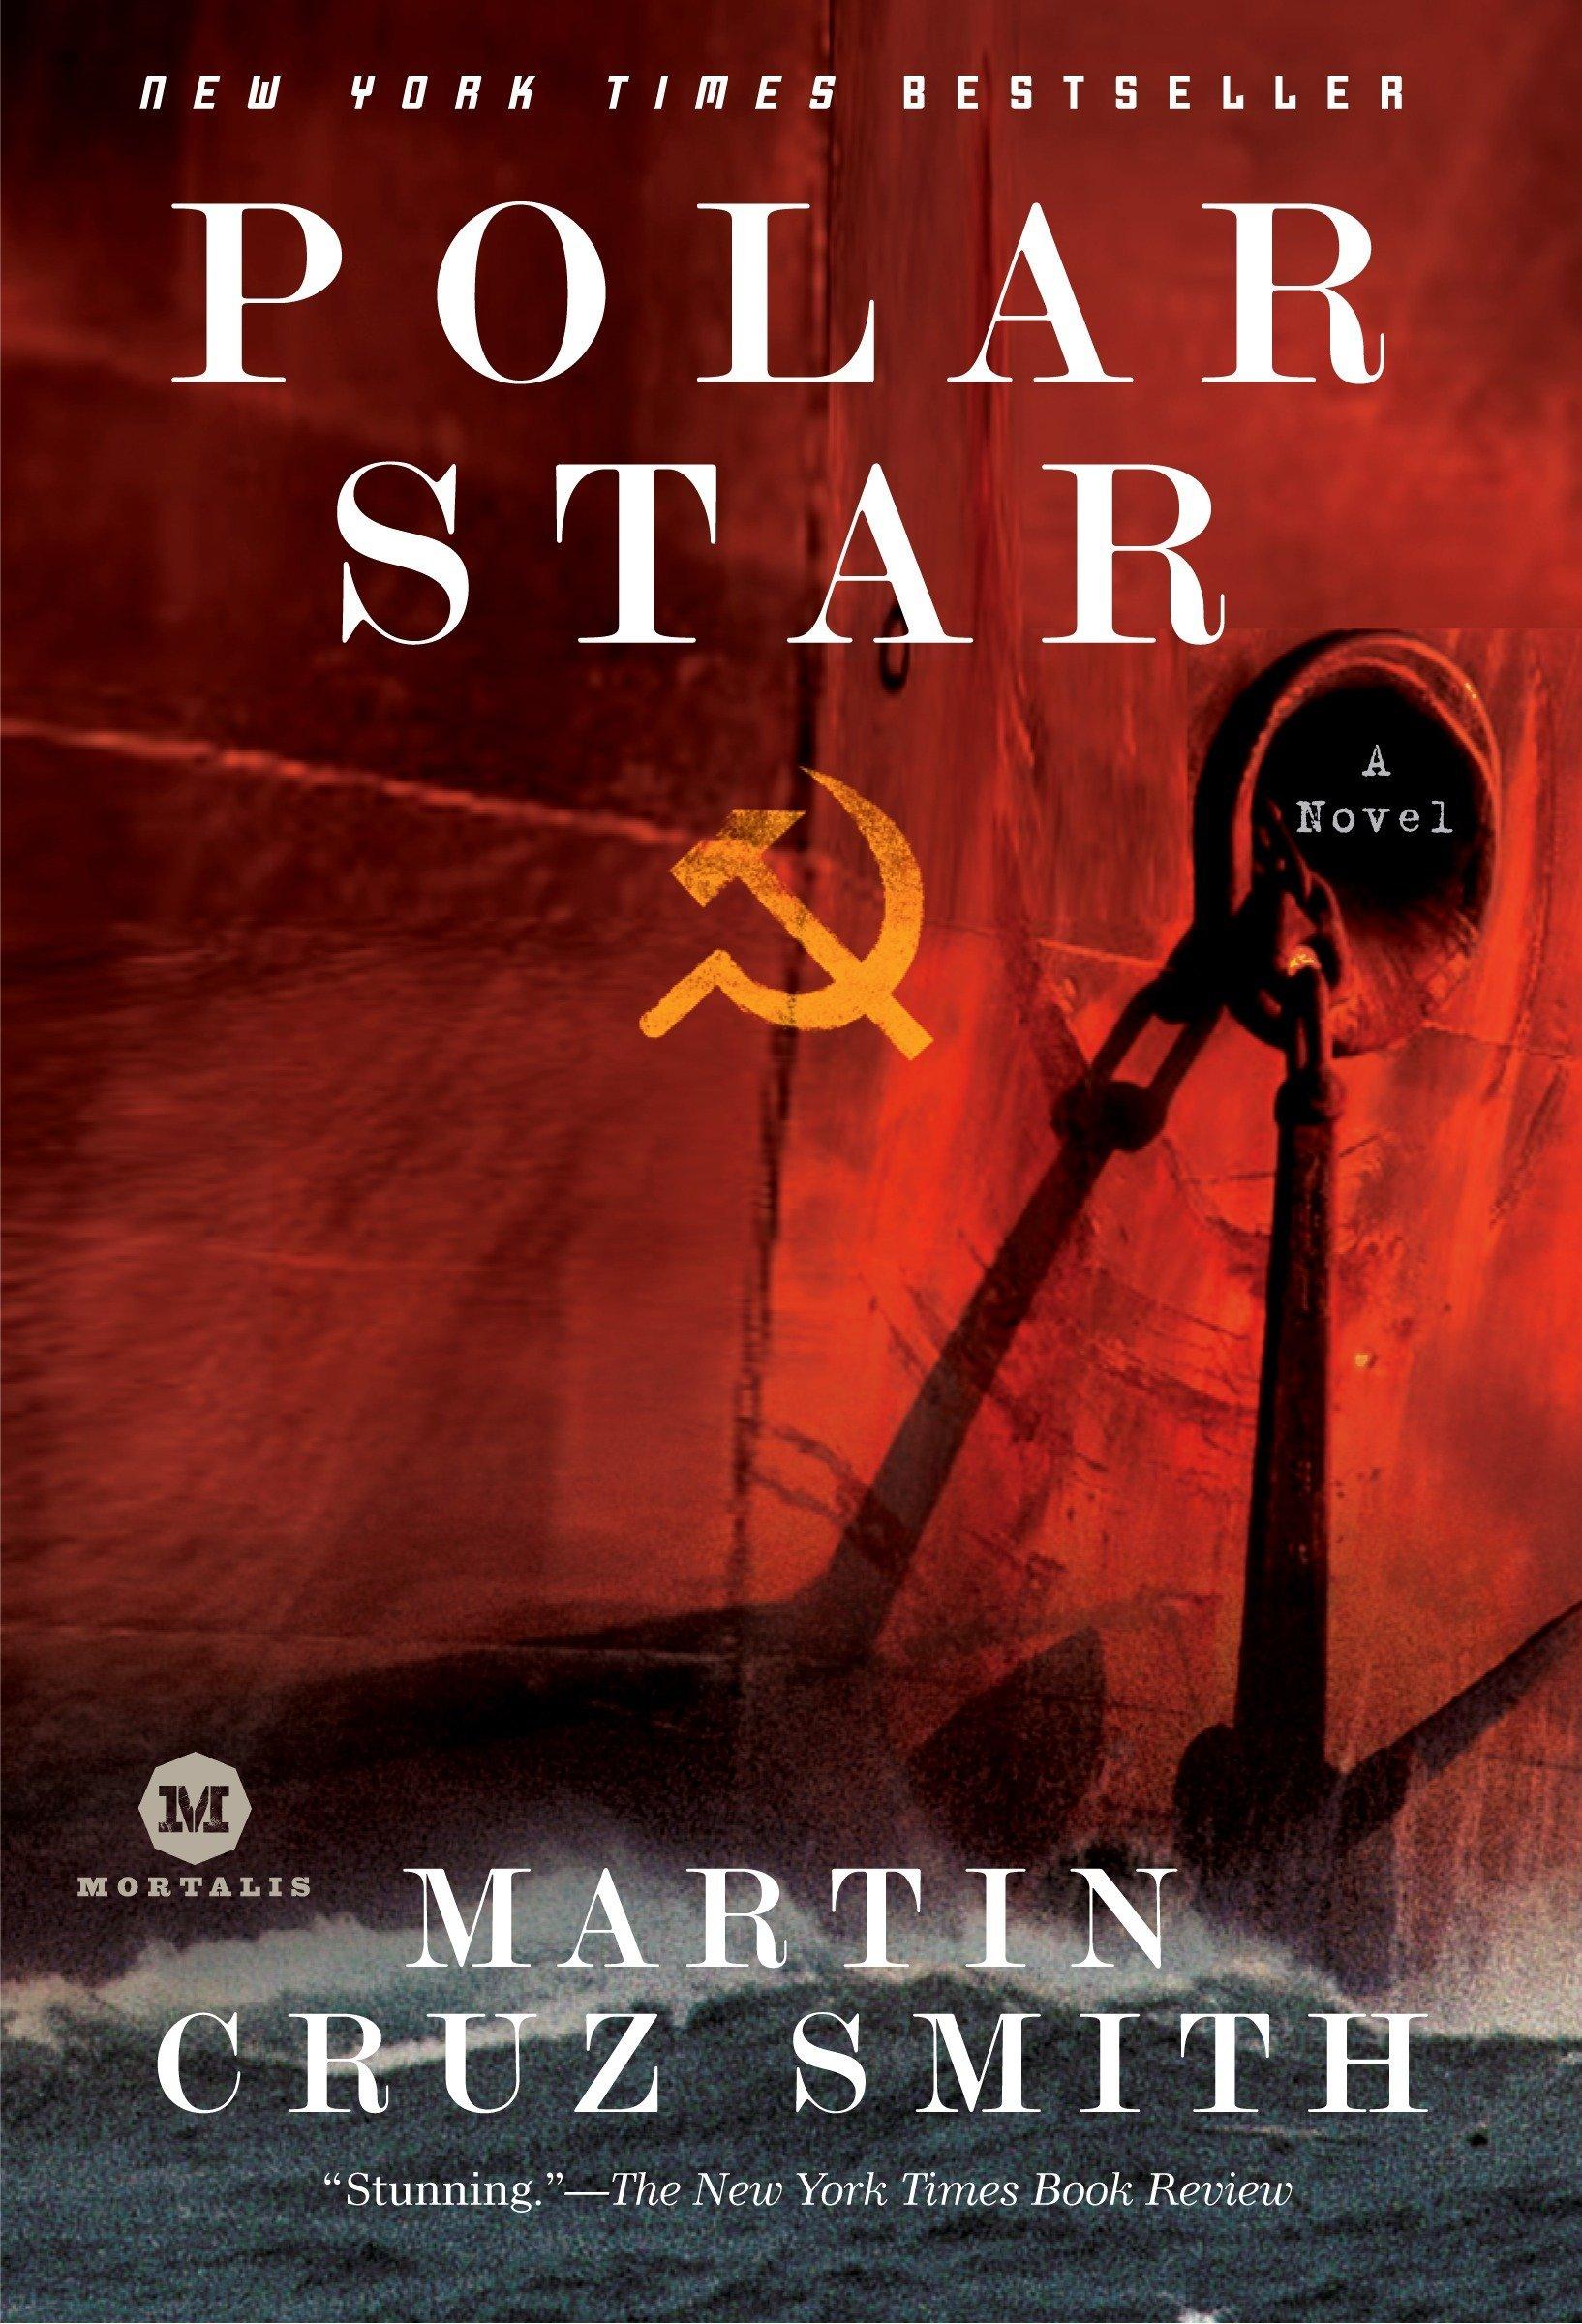 Amazon.com  Polar Star (9780345498175)  Martin Cruz Smith  Books 3f9b607403b93